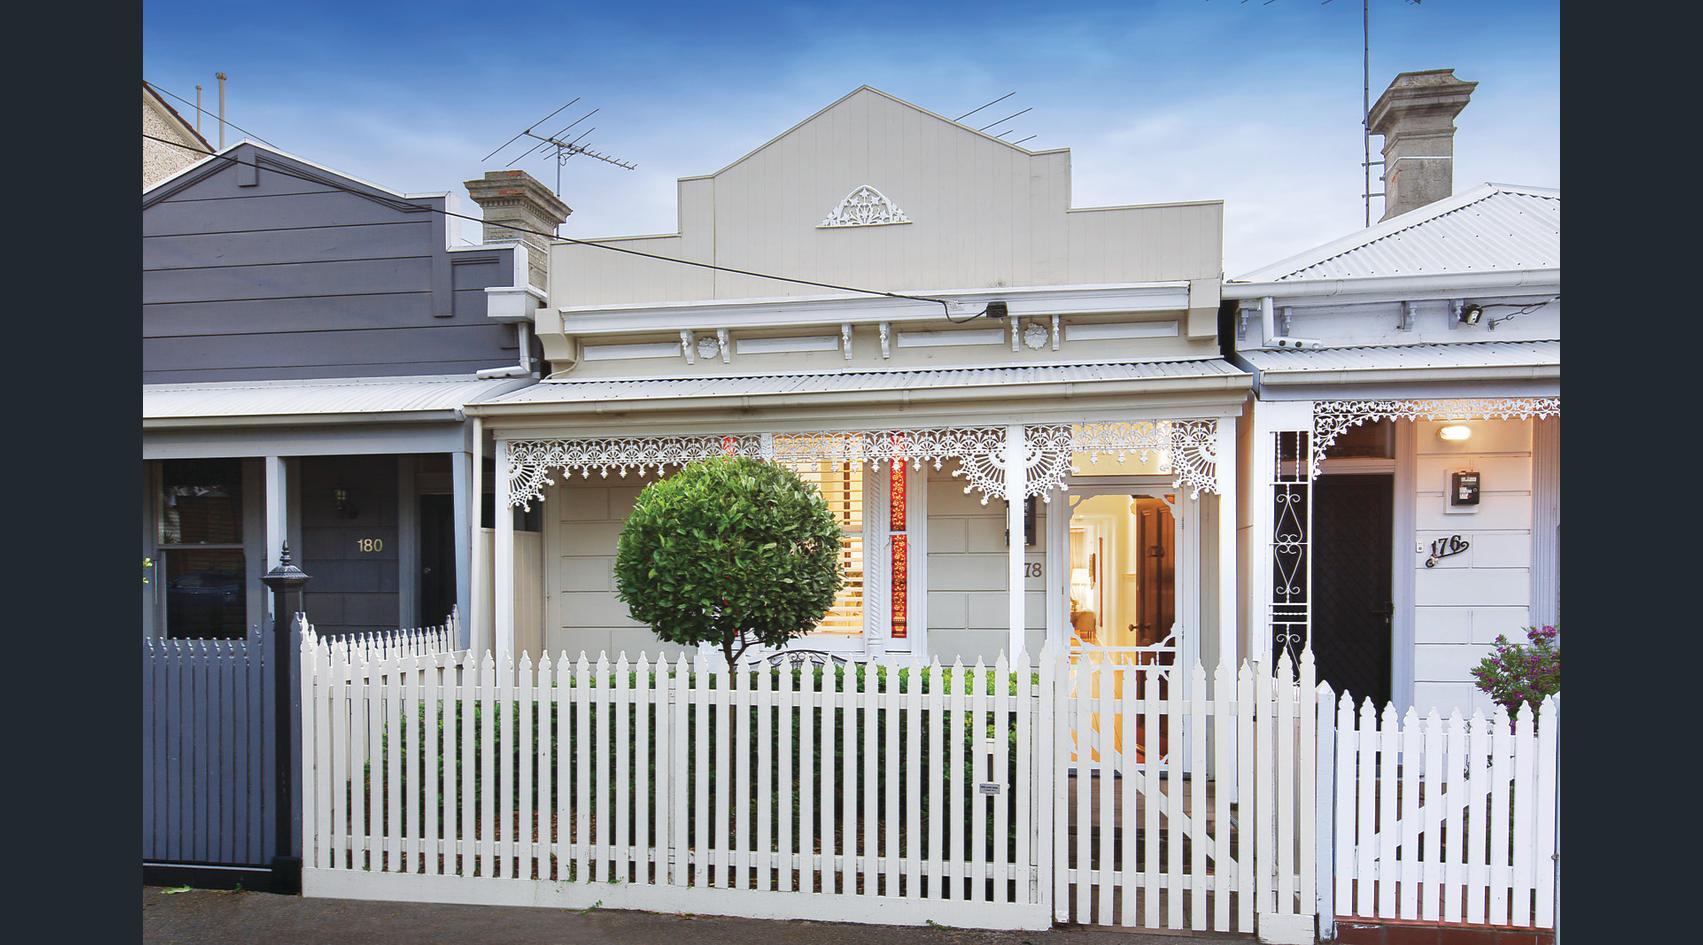 178-farrell-street-port-melbourne-student-accommodation-Melbourne-Exterior2-Unilodgers